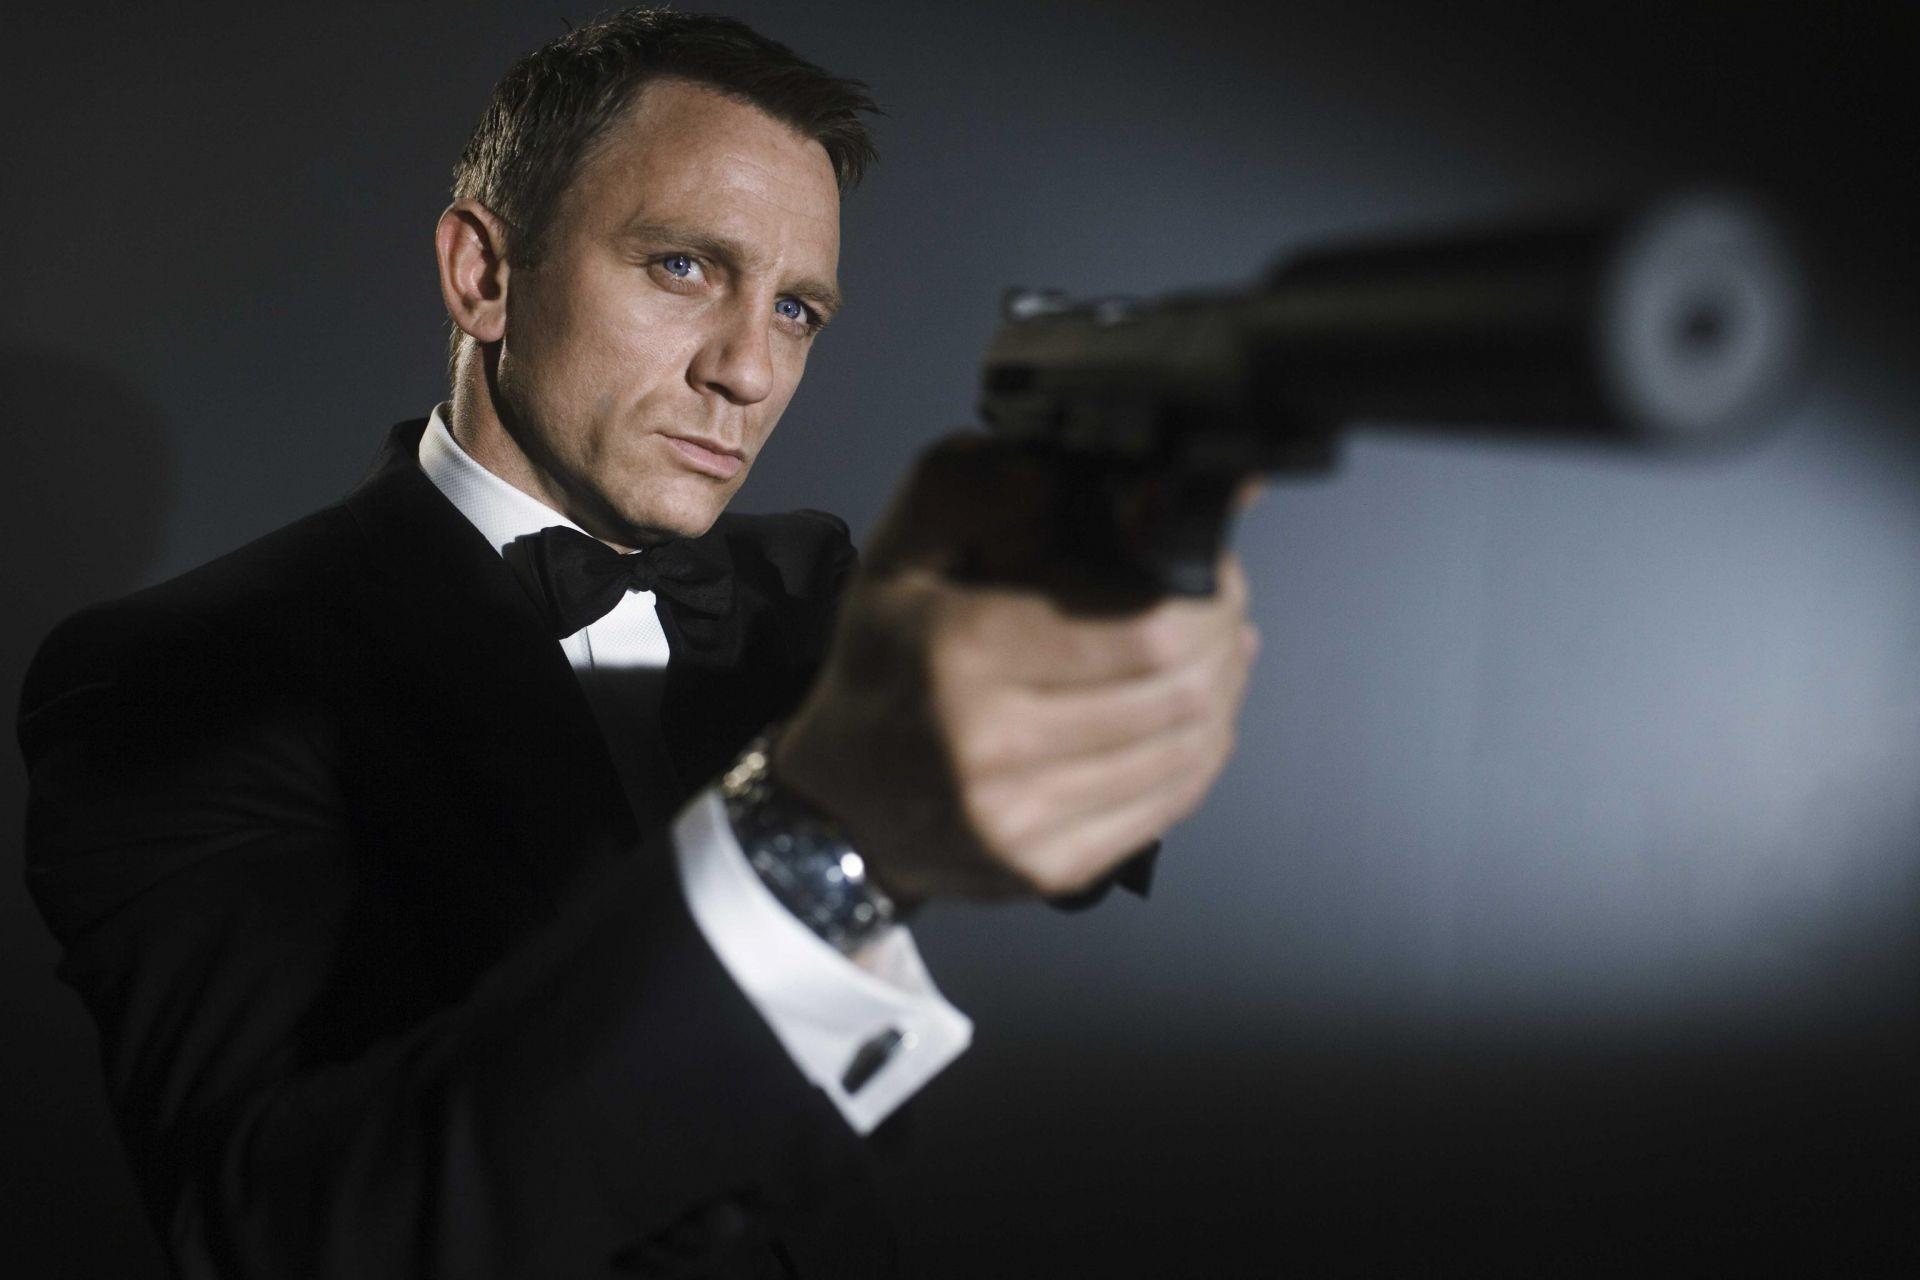 james bond 007 daniel craig. desktop wallpapers for free.